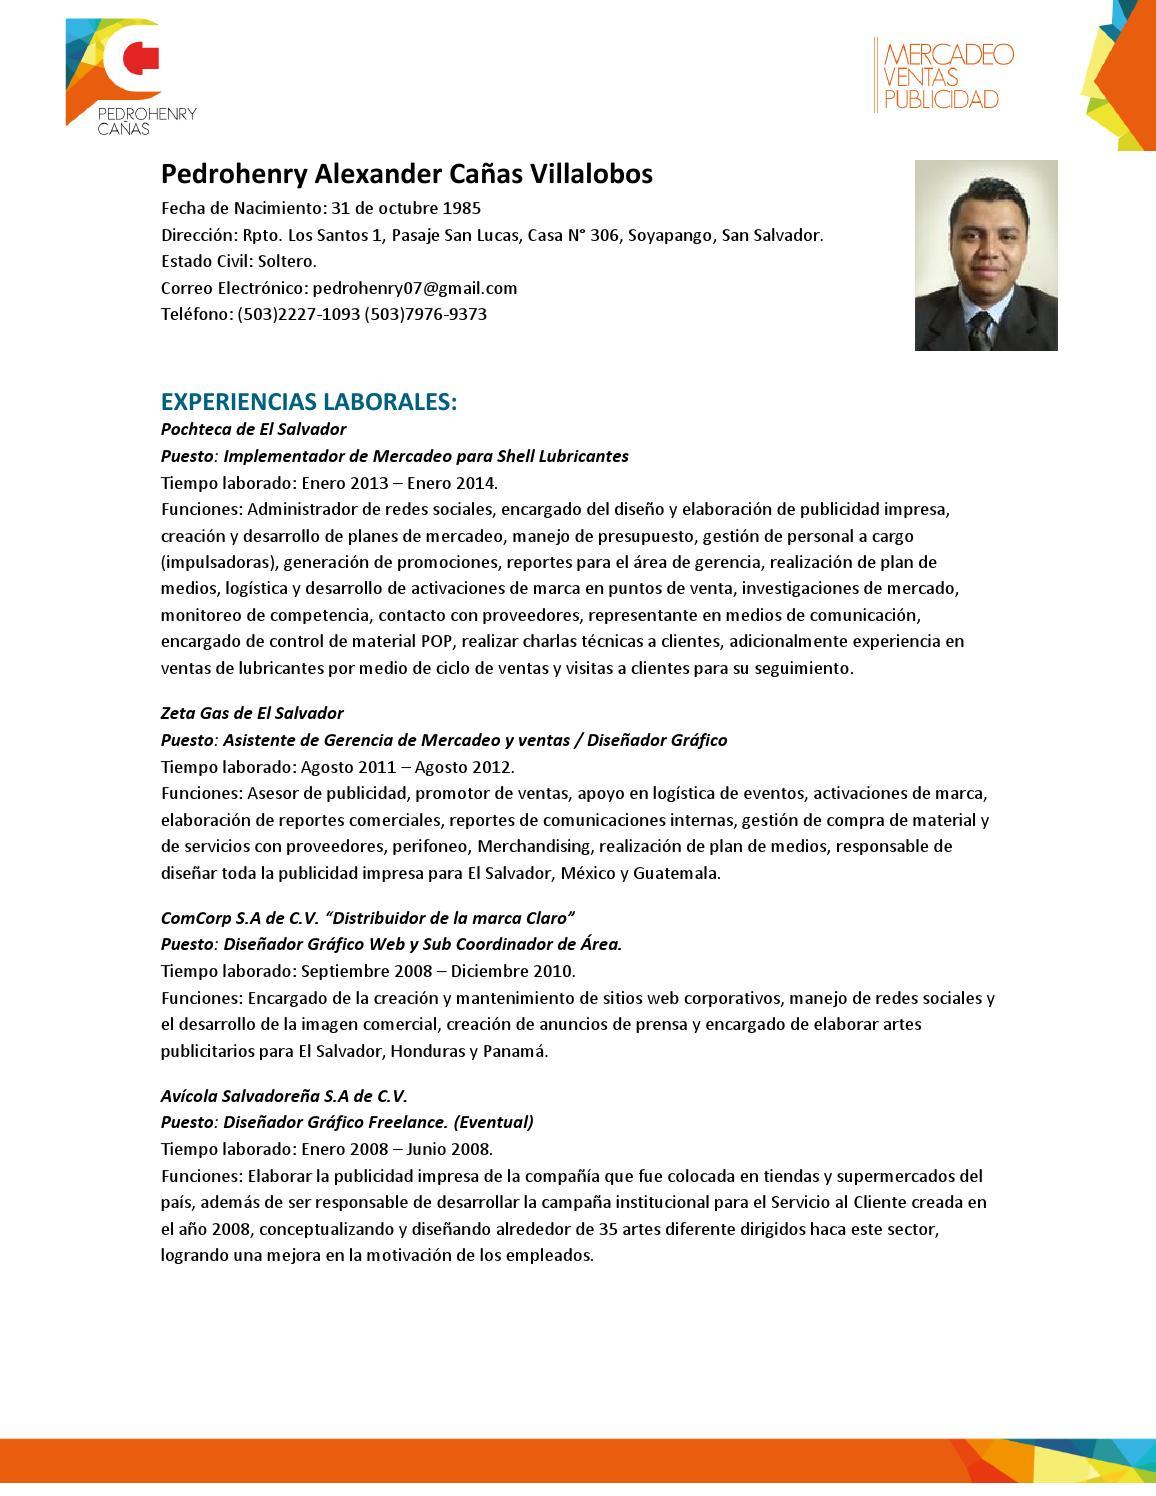 Curriculum Vitae - Pedrohenry Cañas by Henry Cañas - issuu